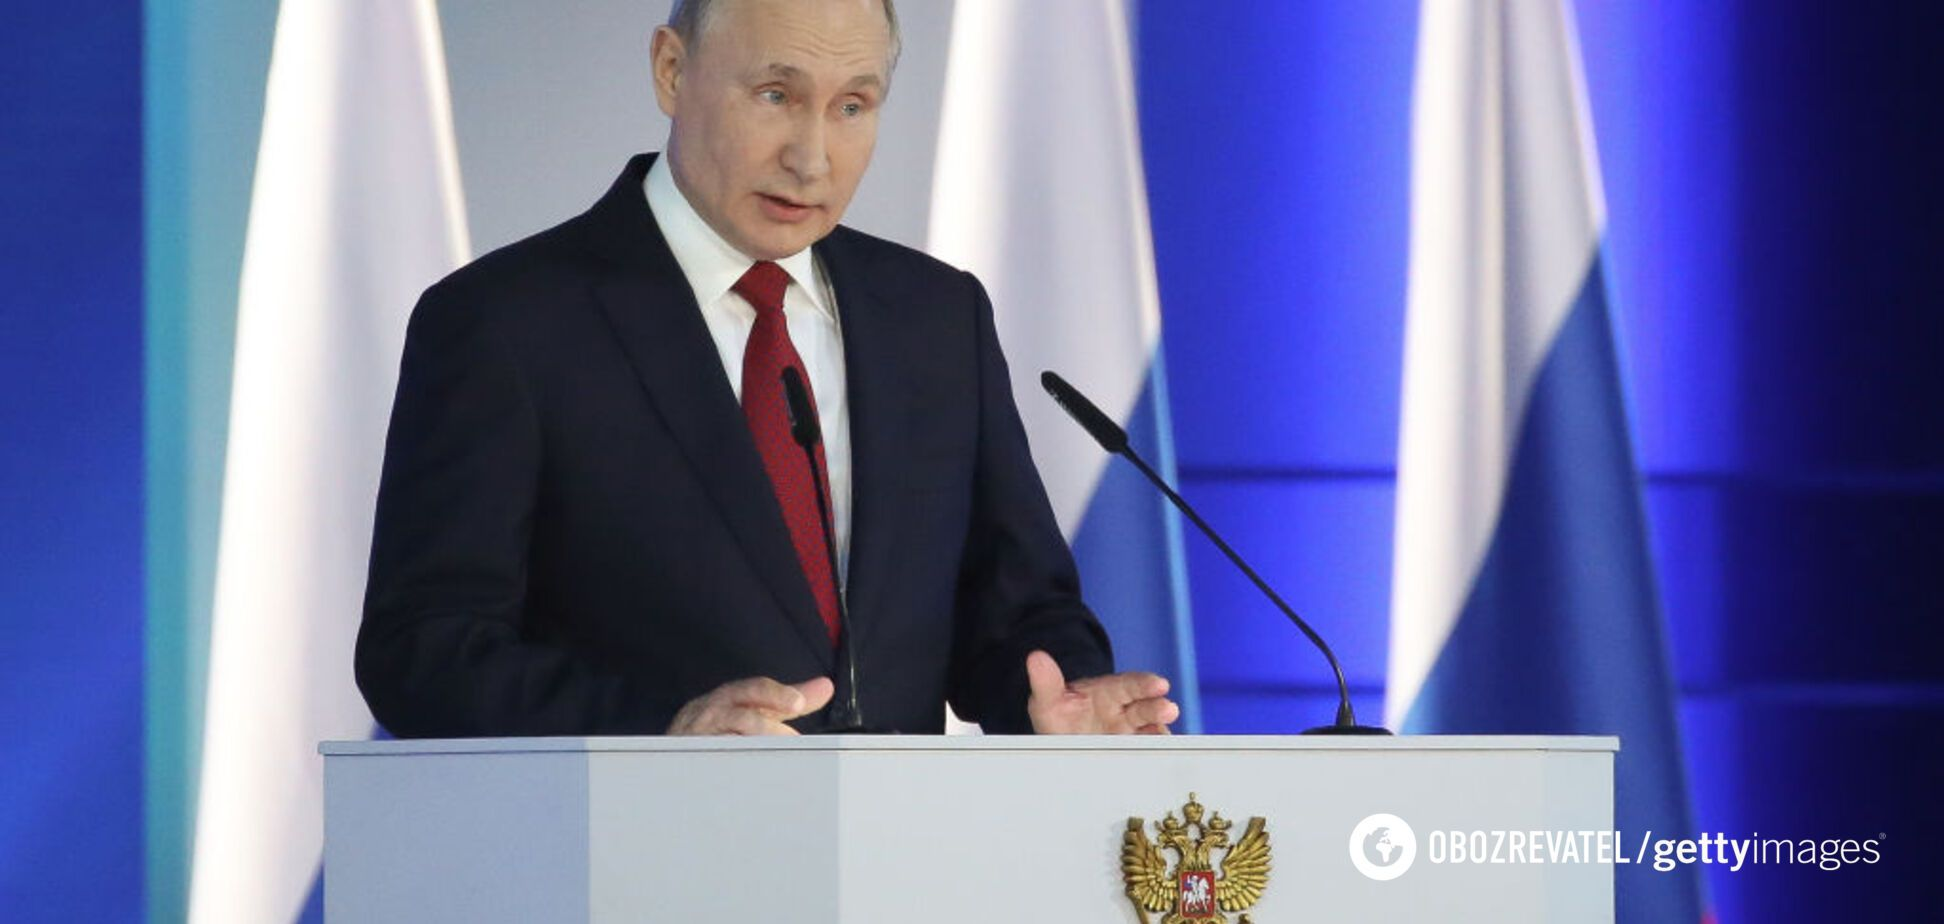 Дилемма дня – Кремль или морг